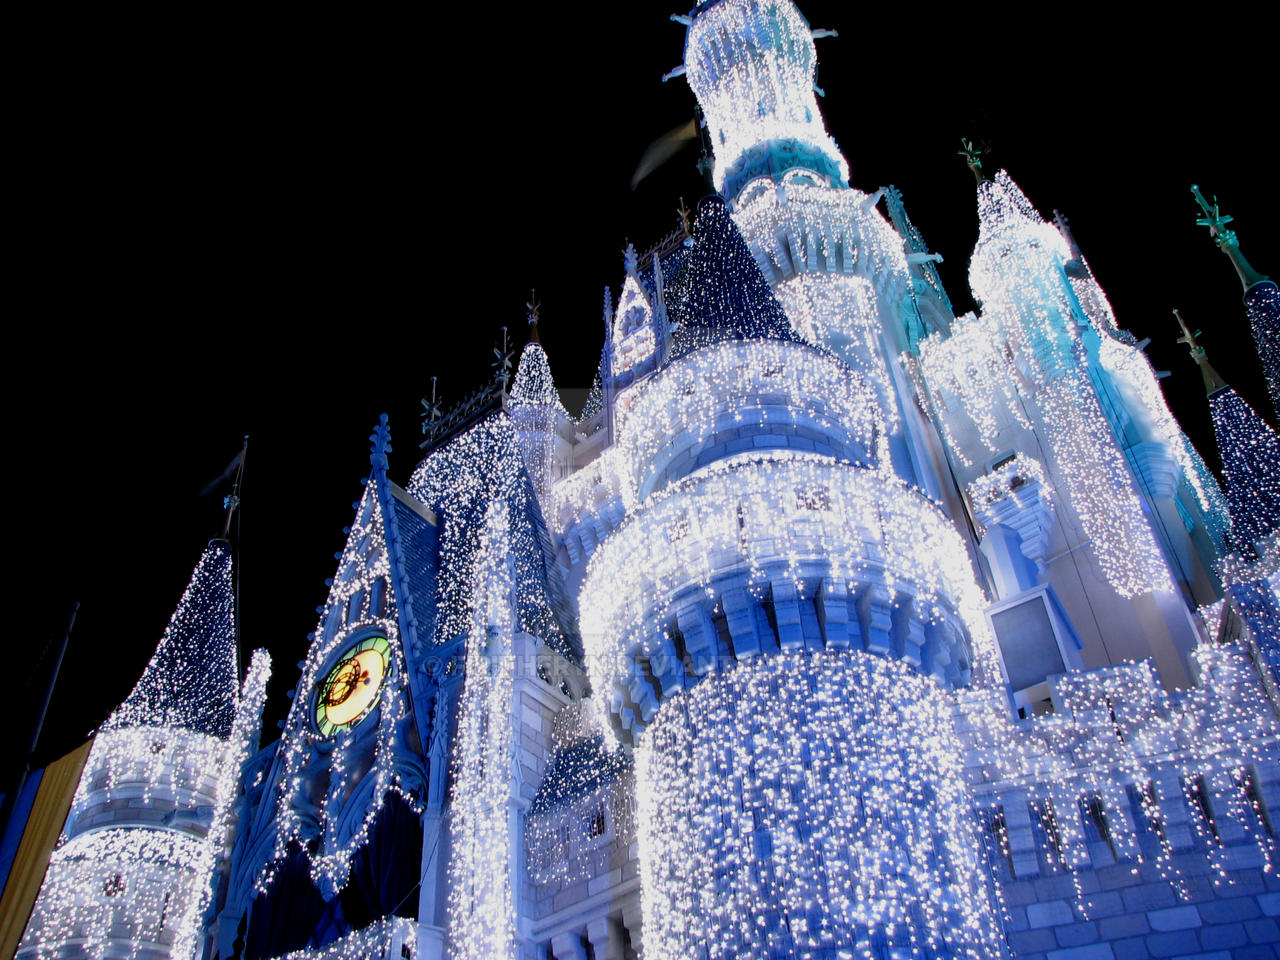 Magical Castle by firitheryn